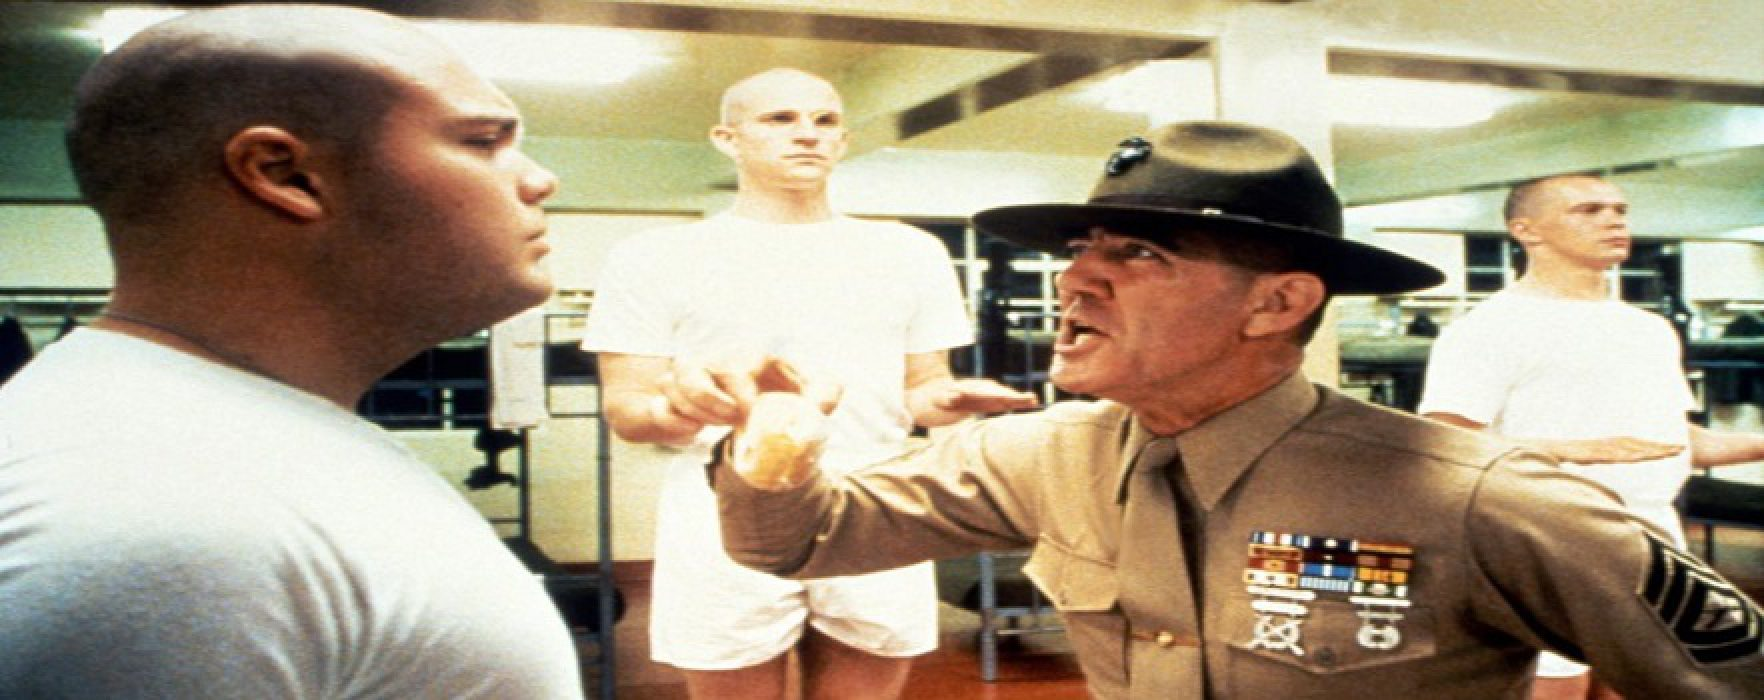 """The Gunny"" R. Lee Ermey Has Died"